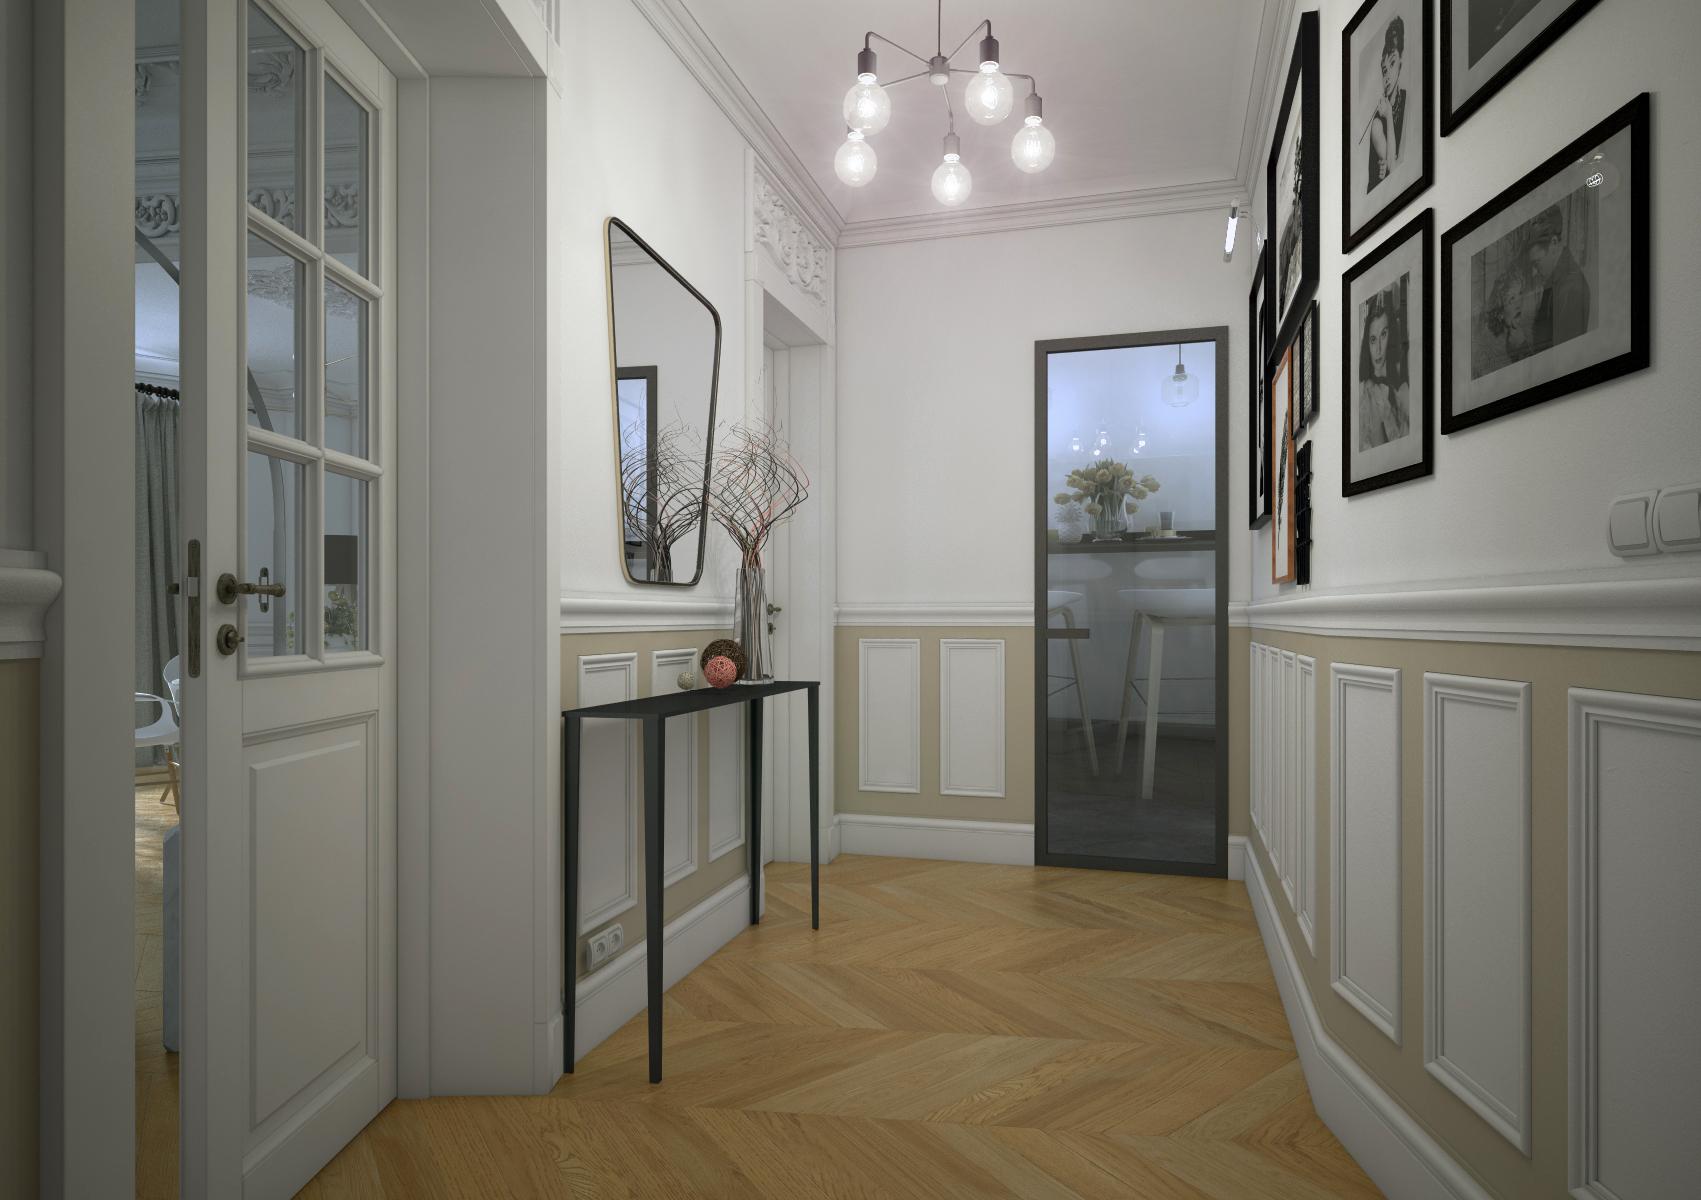 Appartement haussmannien square clignancourt karine Formation decoration interieur paris